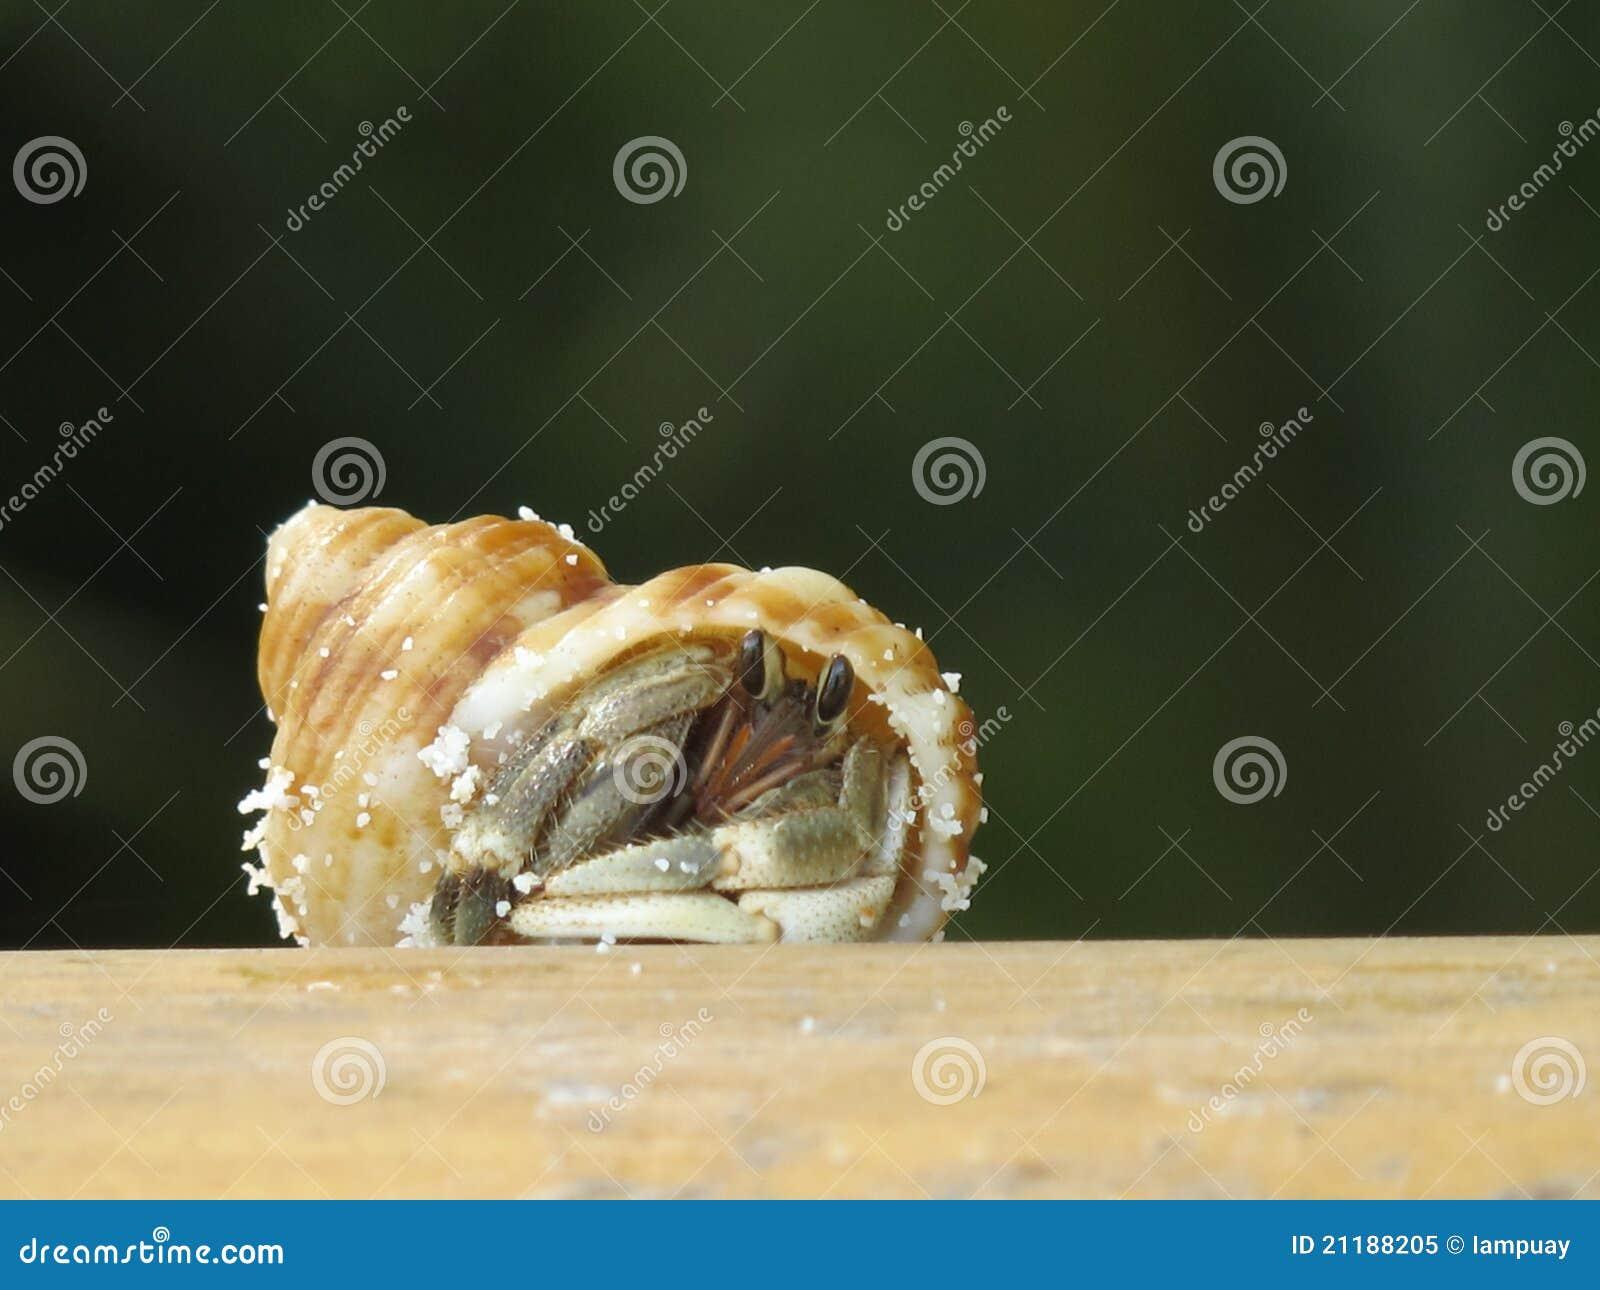 Hermit crab on wood